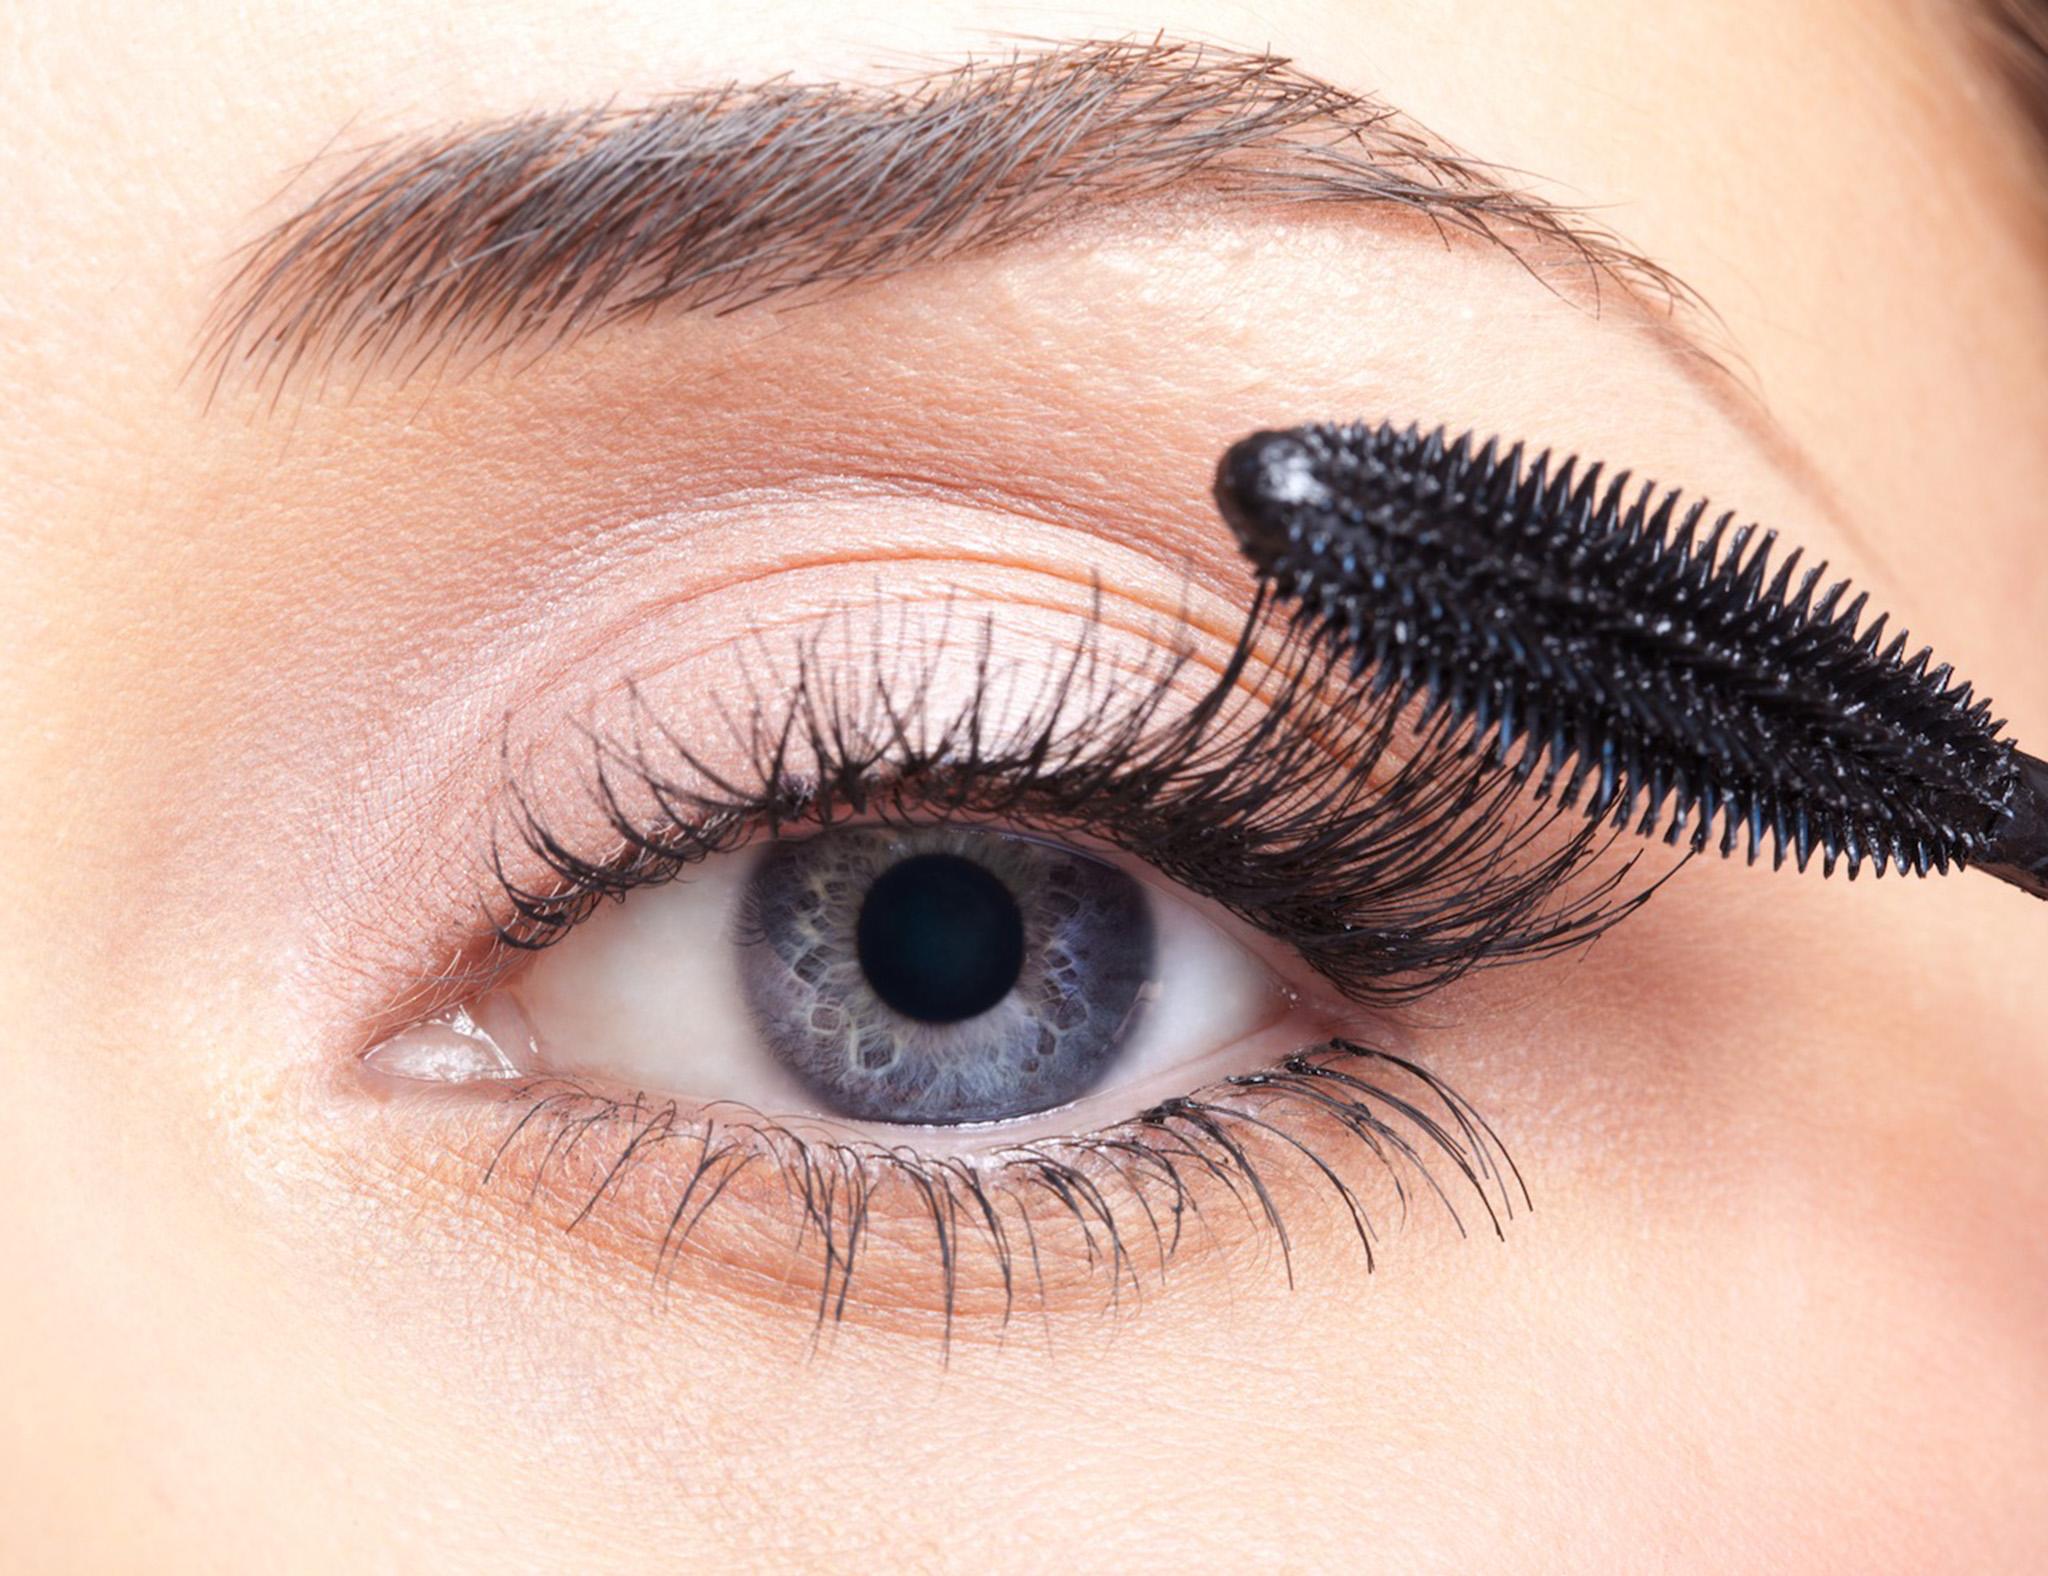 05263e8f587 Yükle (800x800)10Pairs Thick Natural Cross Fake Eye Lashes Transparent False  Eyelashes Professional Makeup Beauty Tips Long False Eye Lashes-in False ...